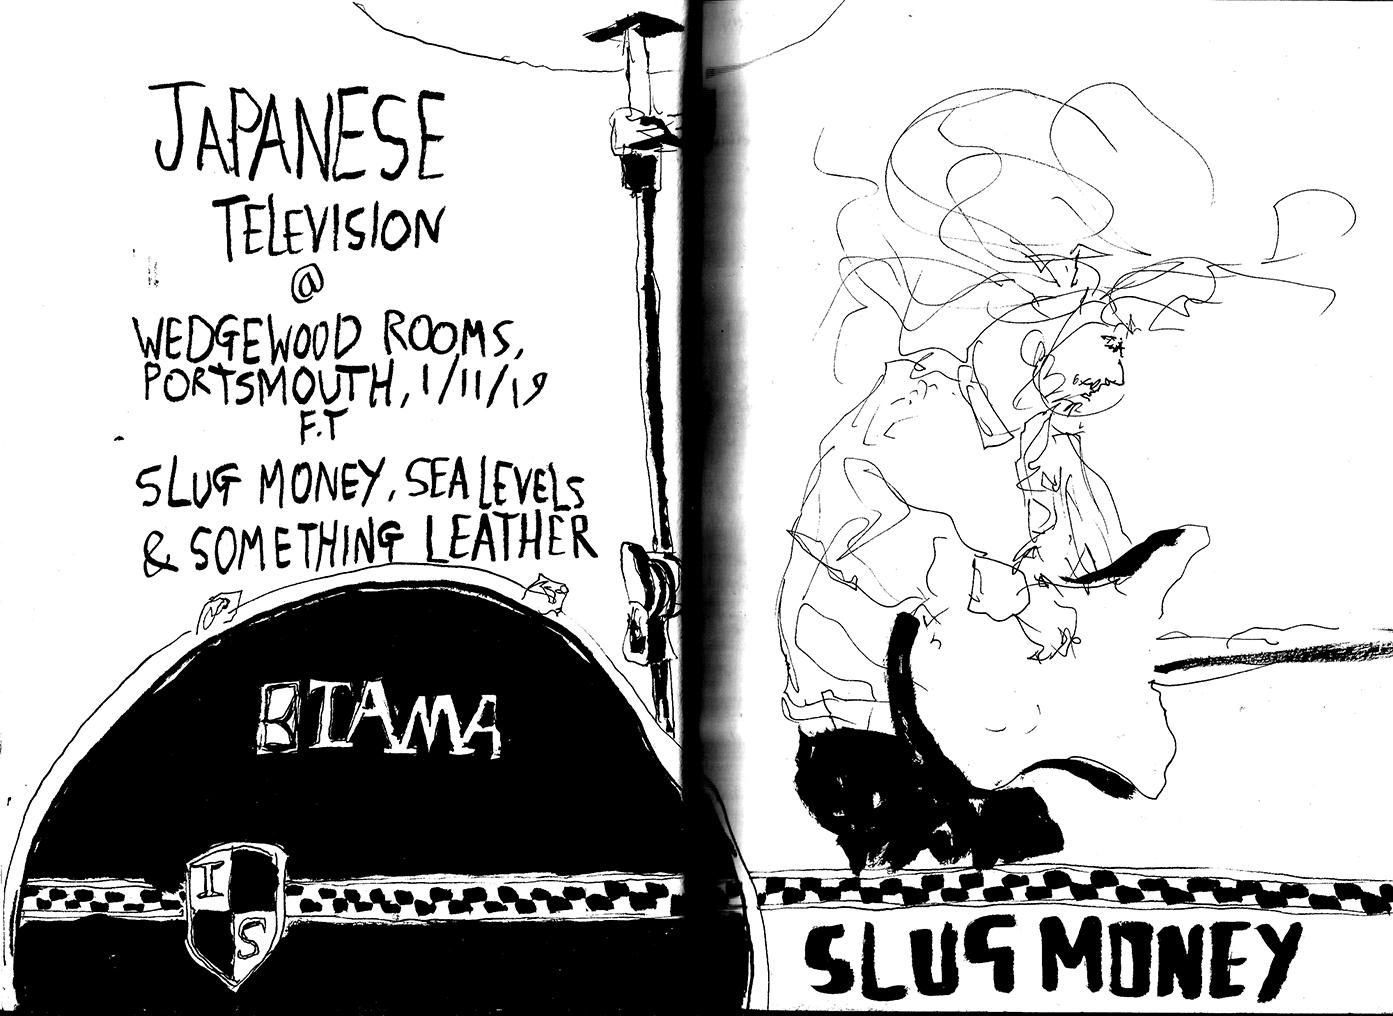 Japanese Television 1